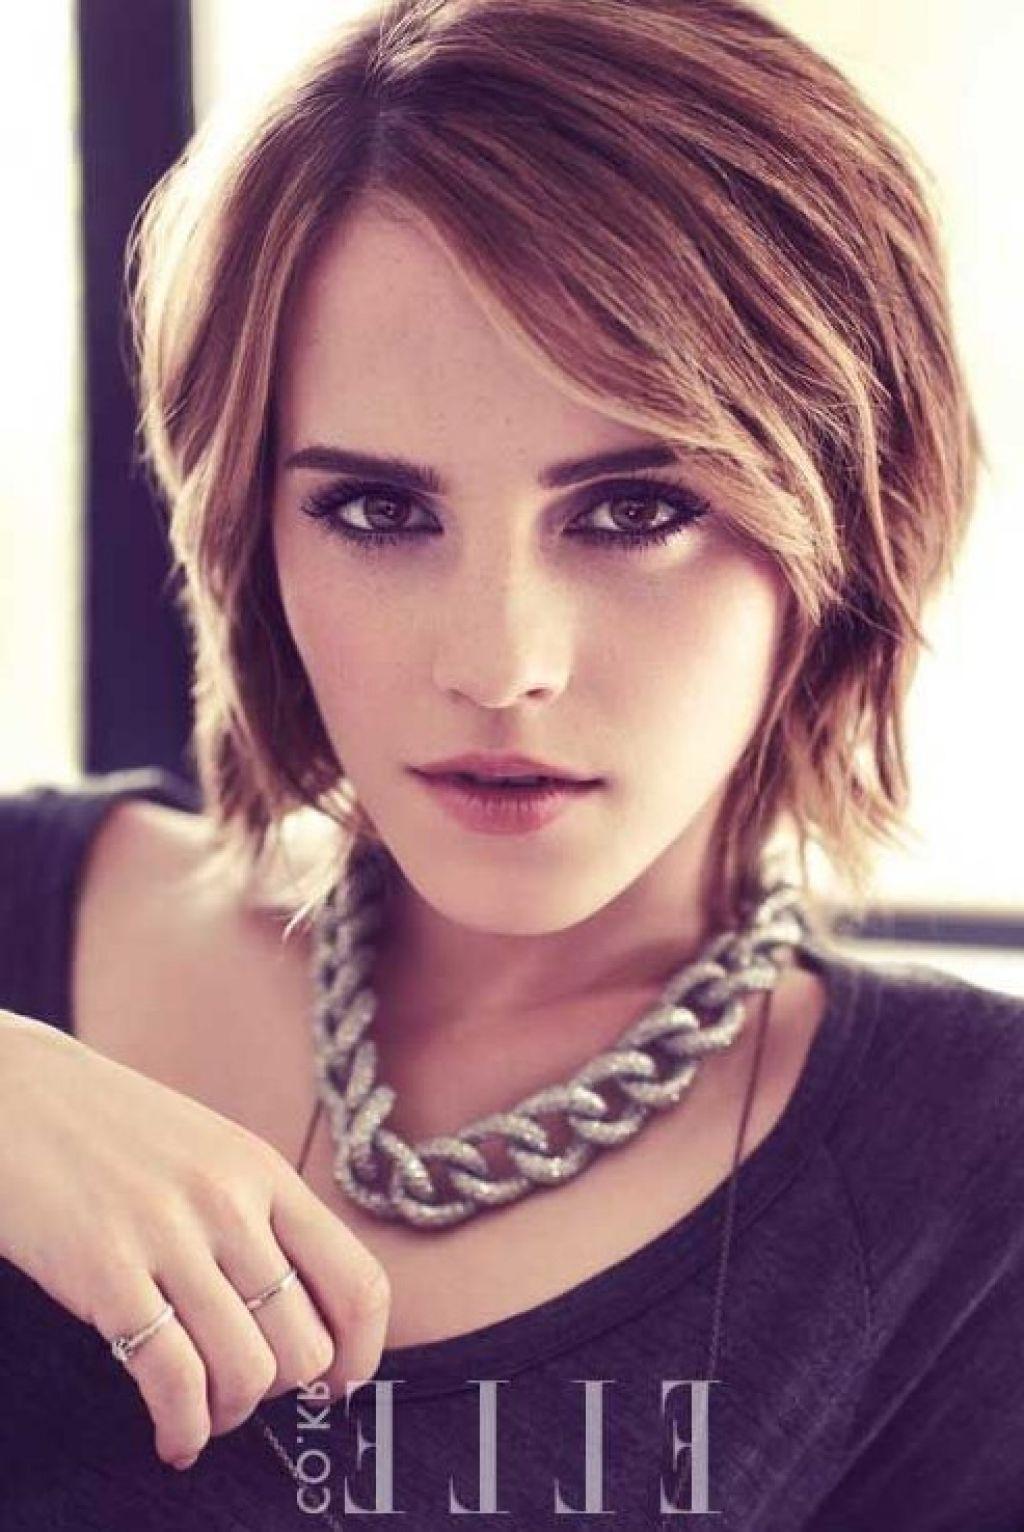 Emma Watson Bob Google Search Hair Envy Other Beauty Likings